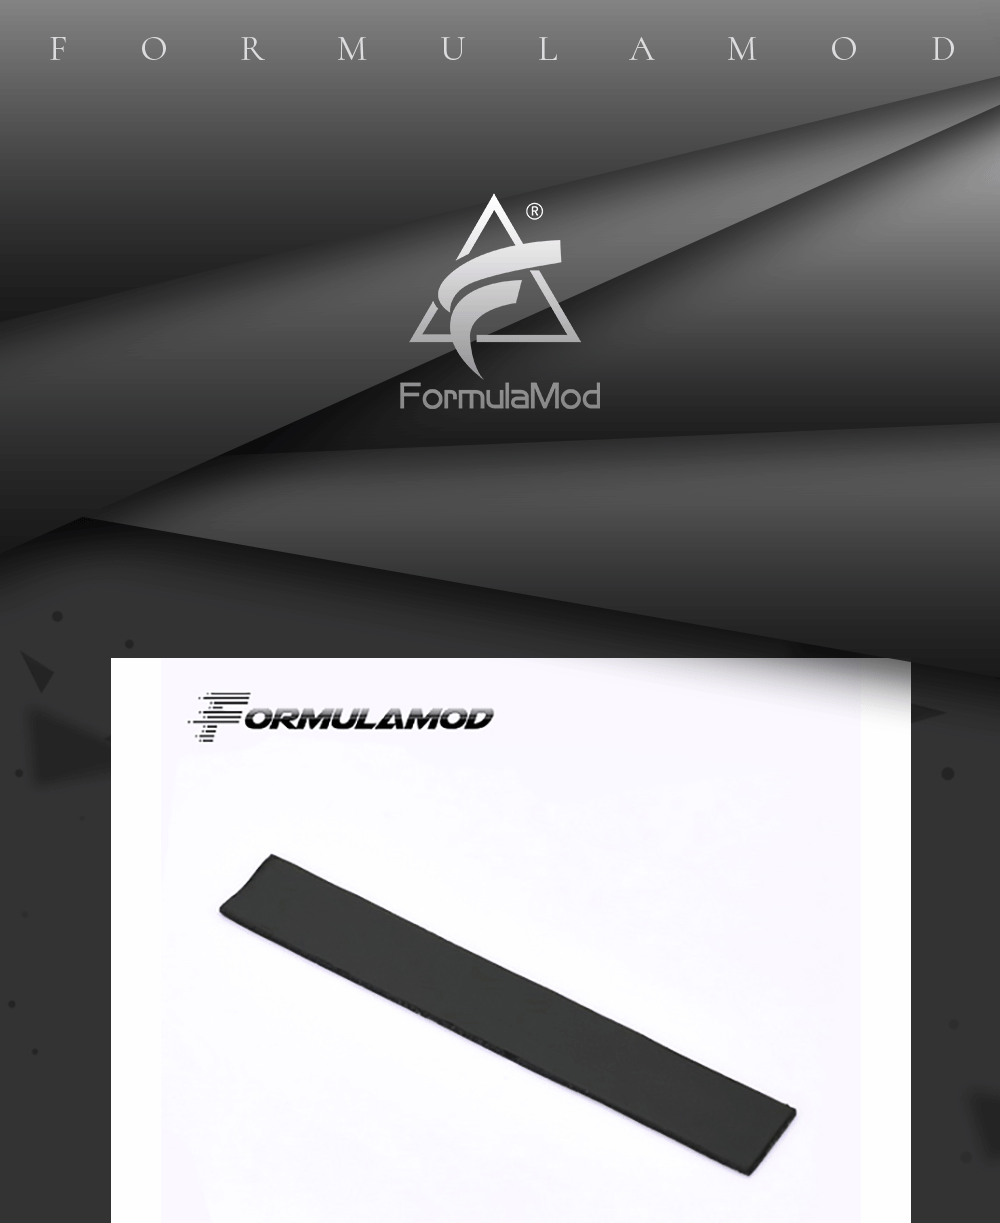 FormulaMod Fm-GRP, Silicone Grease Thermal Pastes, GPU Water Block Thermal Pastes,